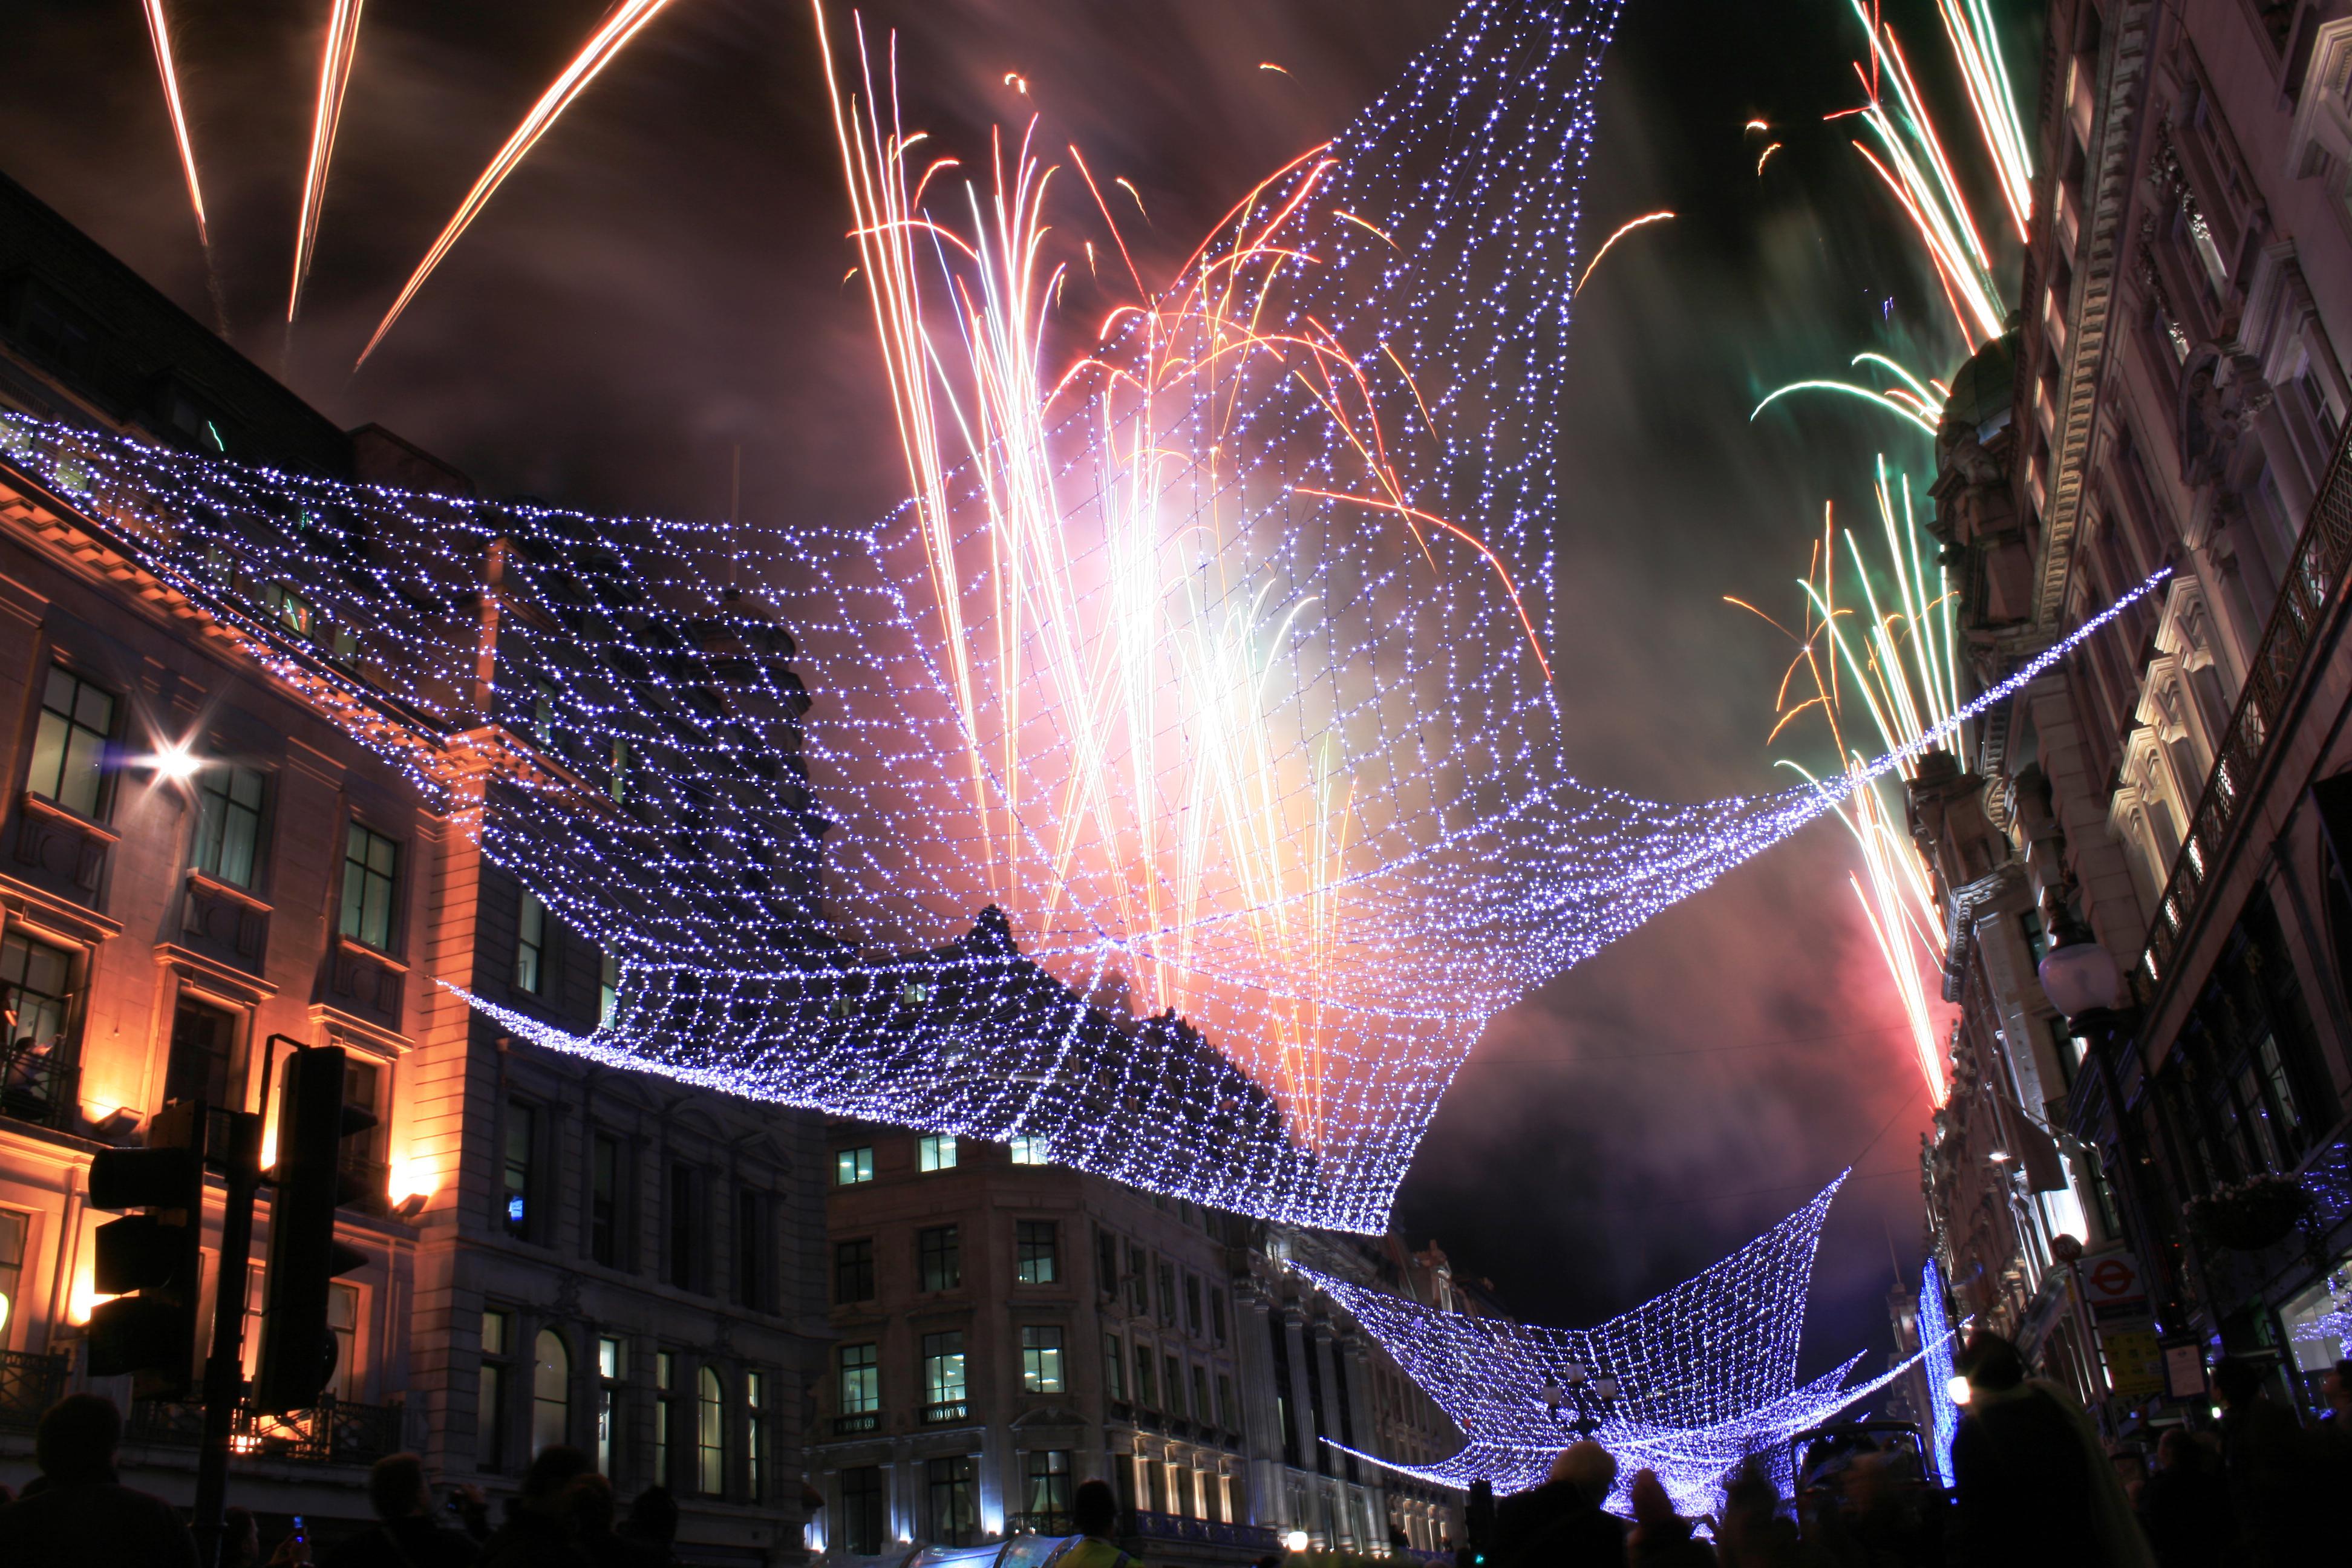 fileregent street christmas lights switched onjpg